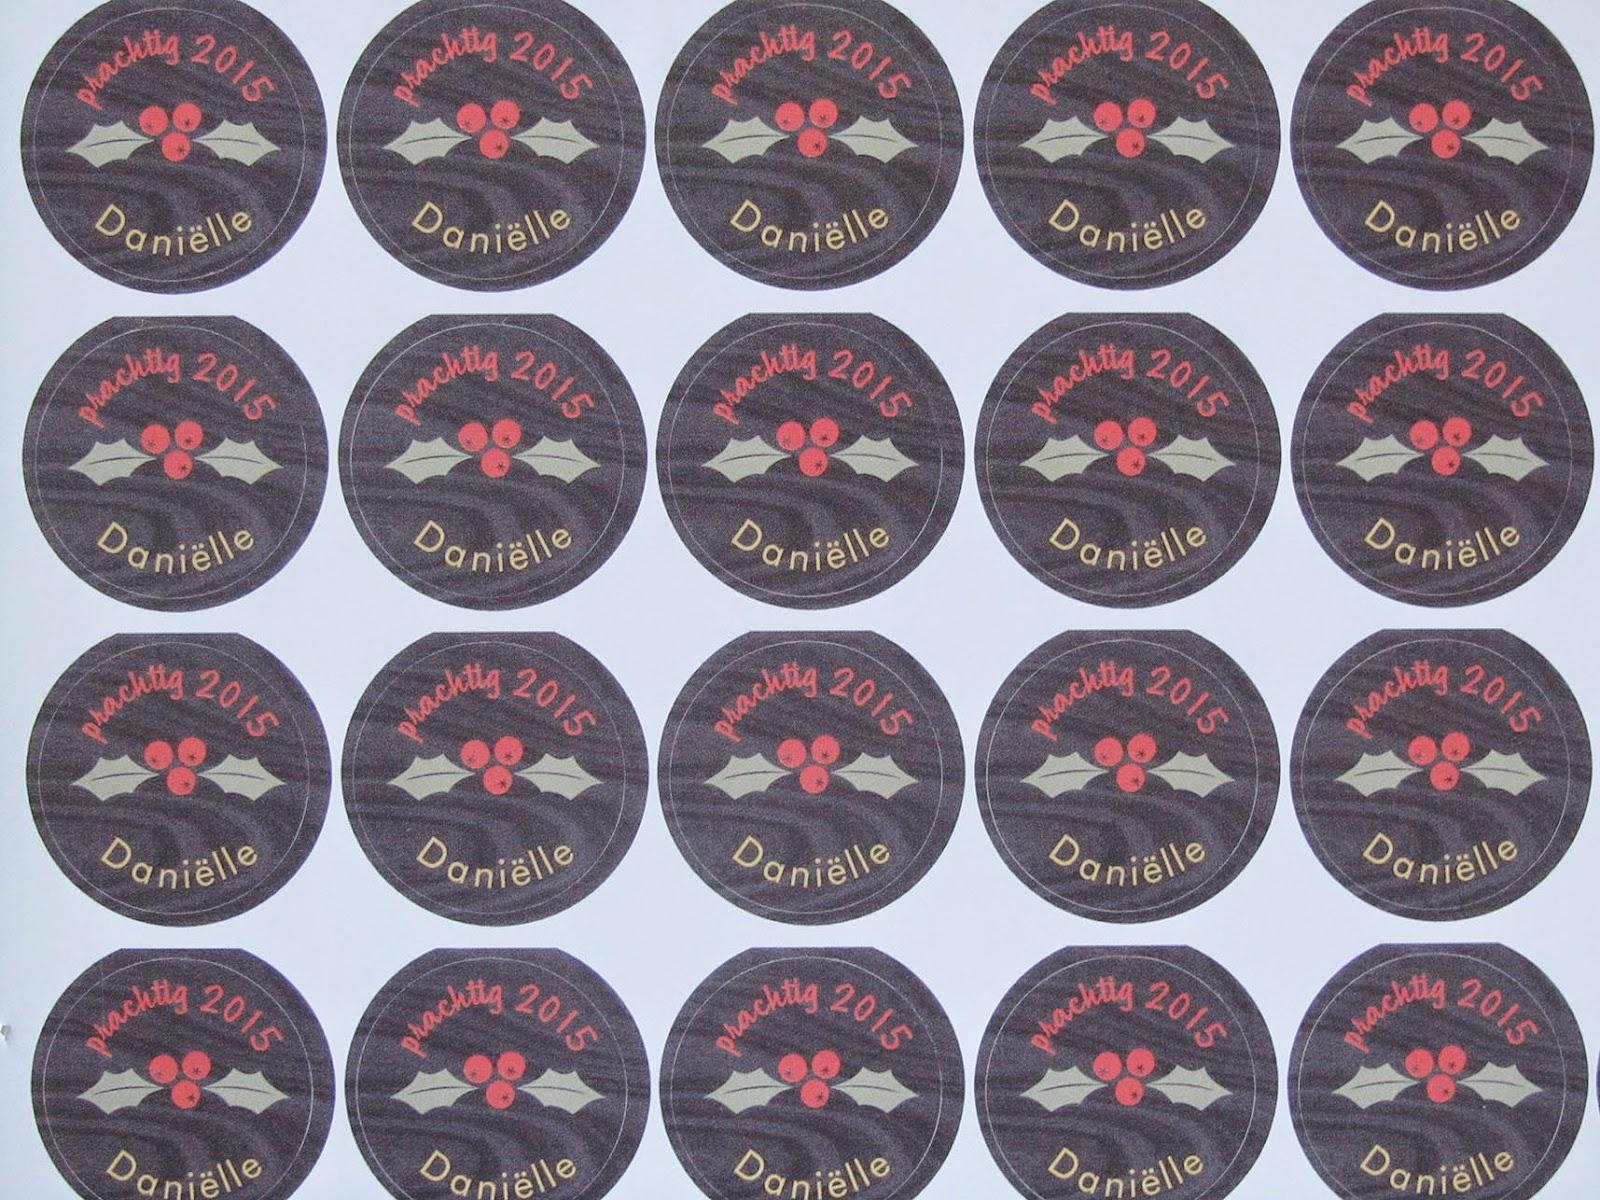 christmas envelope stickers 2014